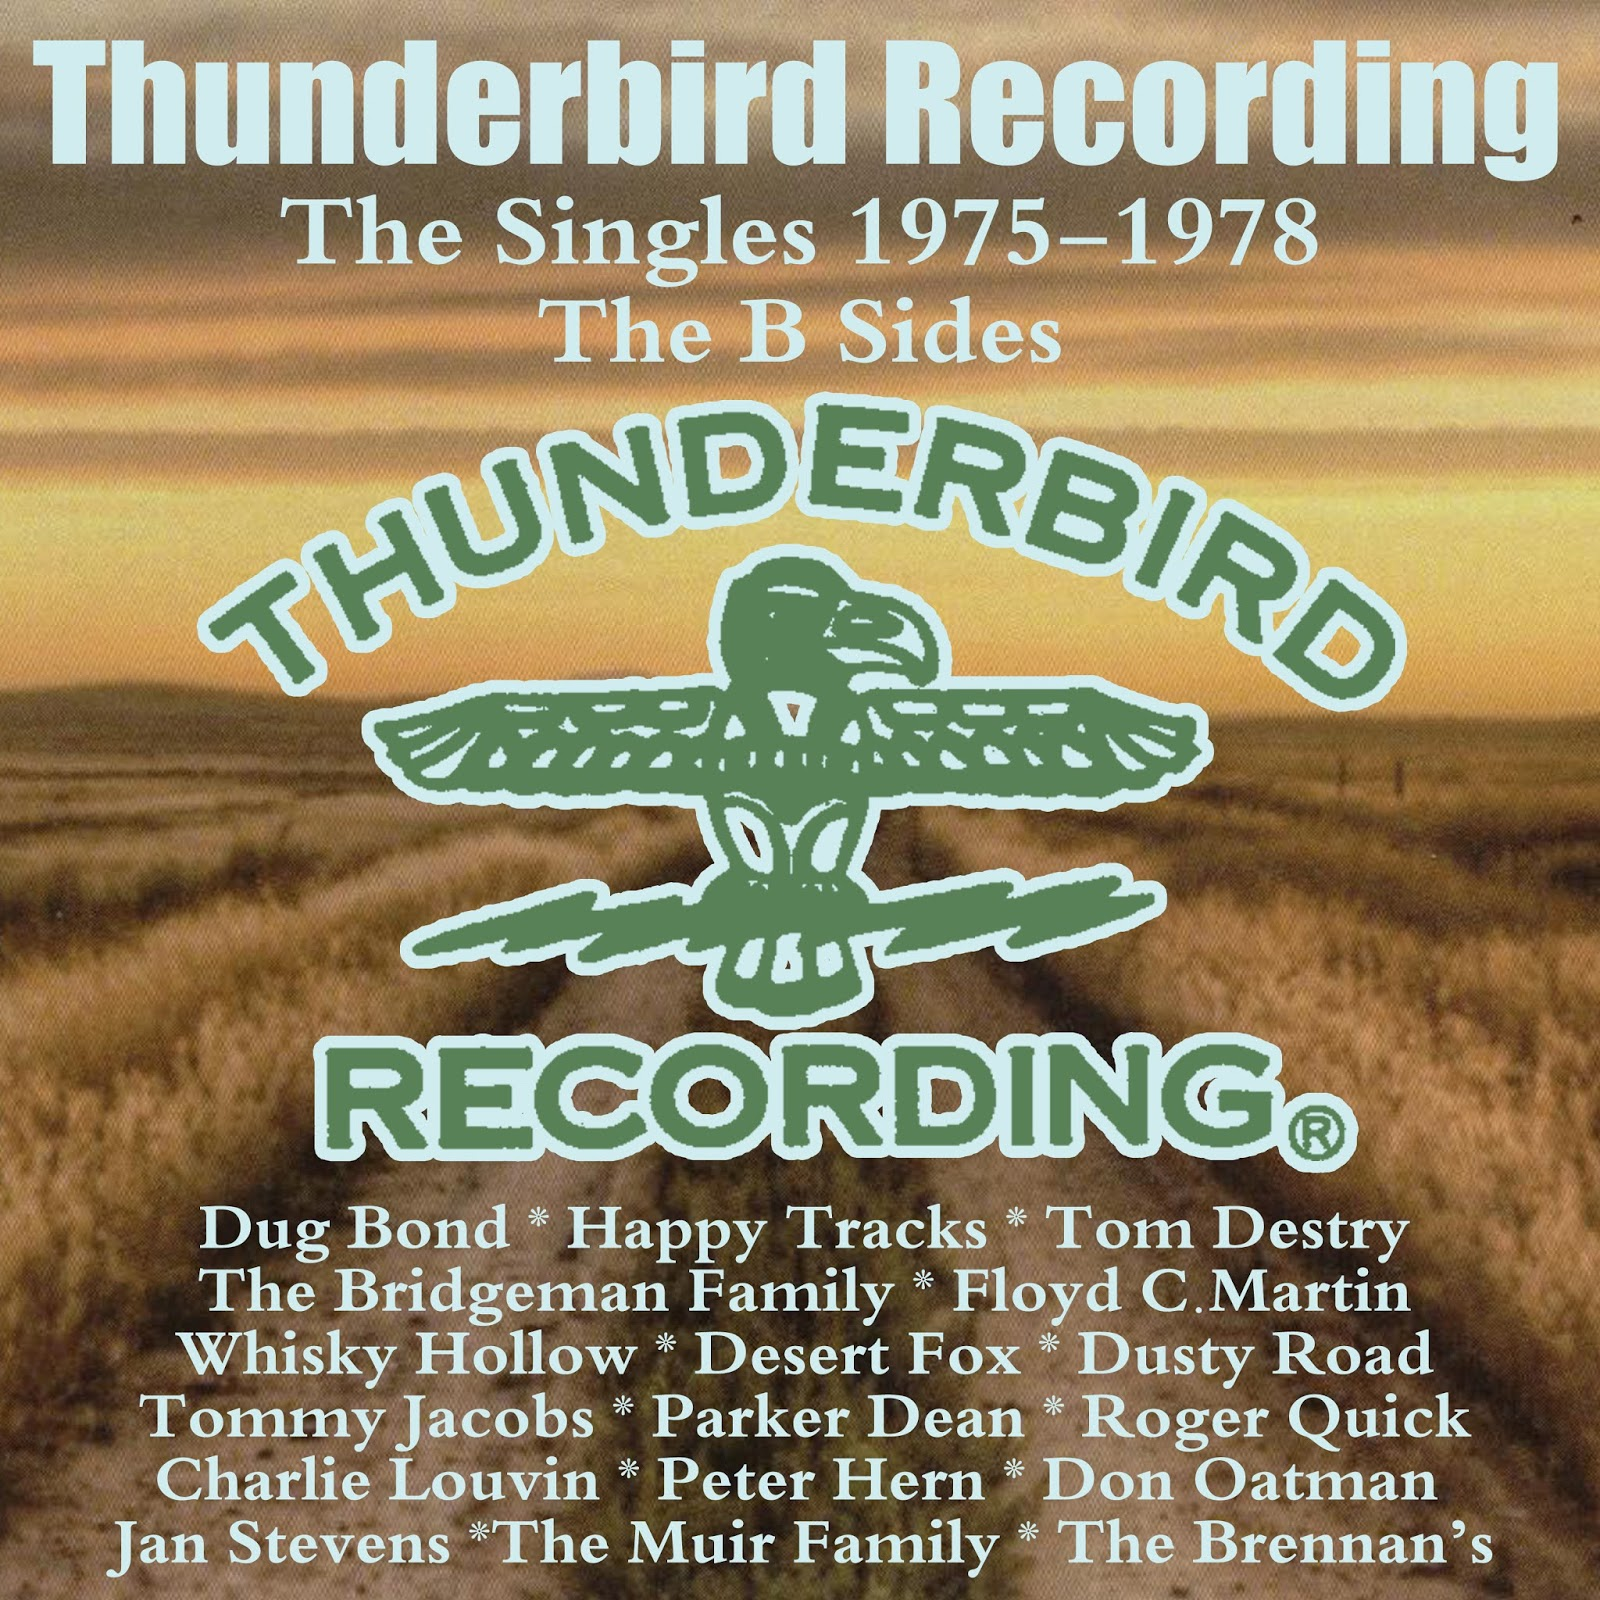 Thunderbird singles